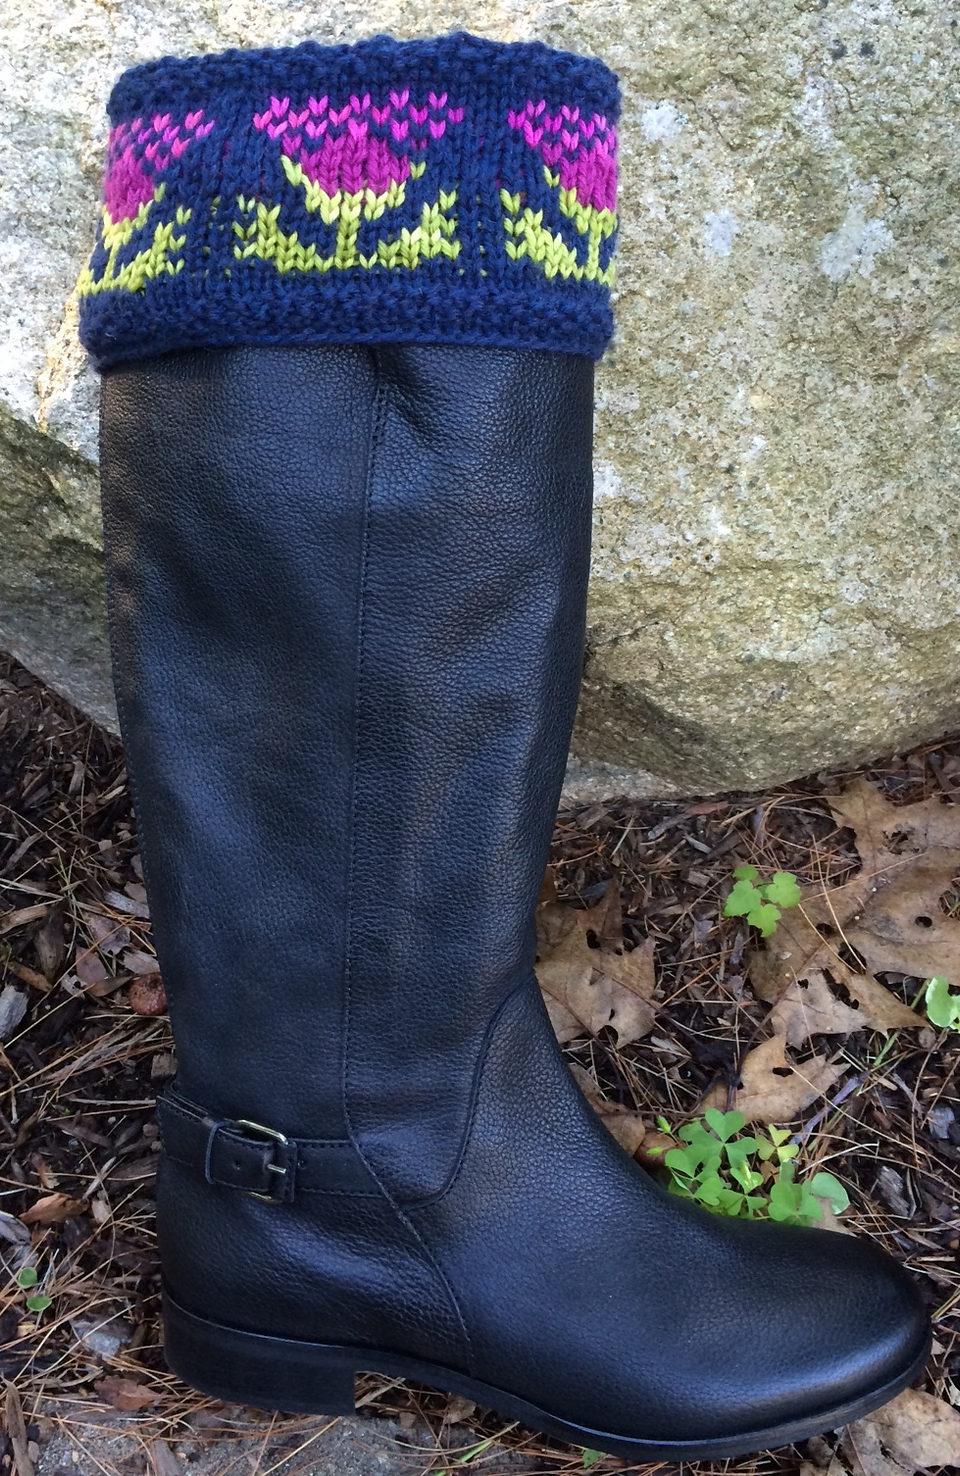 Free Knitting Pattern for Muir Glenn Thistle Boot Toppers